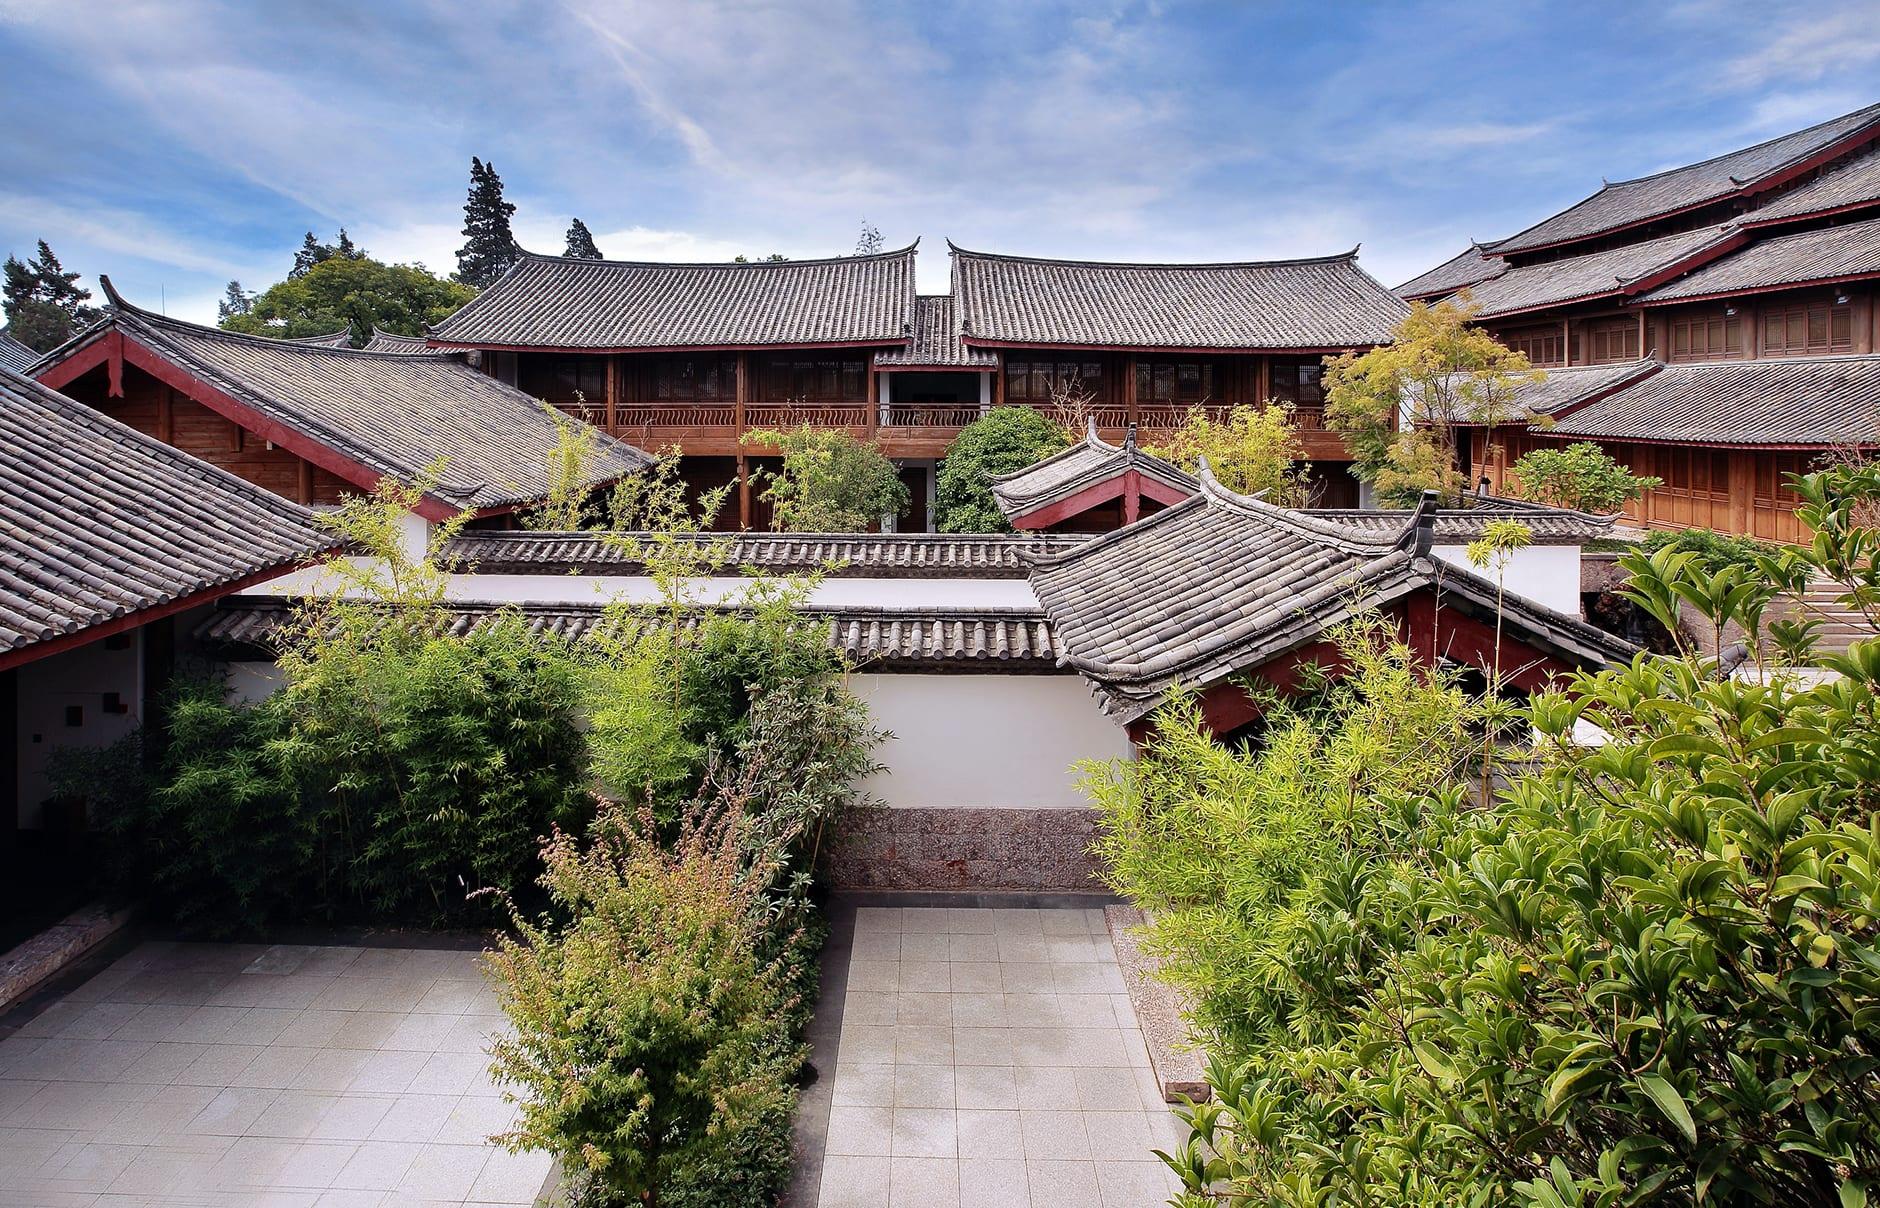 Amandayan - Courtyard. Amandayan, Lijiang, China. Luxury Hotel Review by TravelPlusStyle. Photo © Aman Resorts